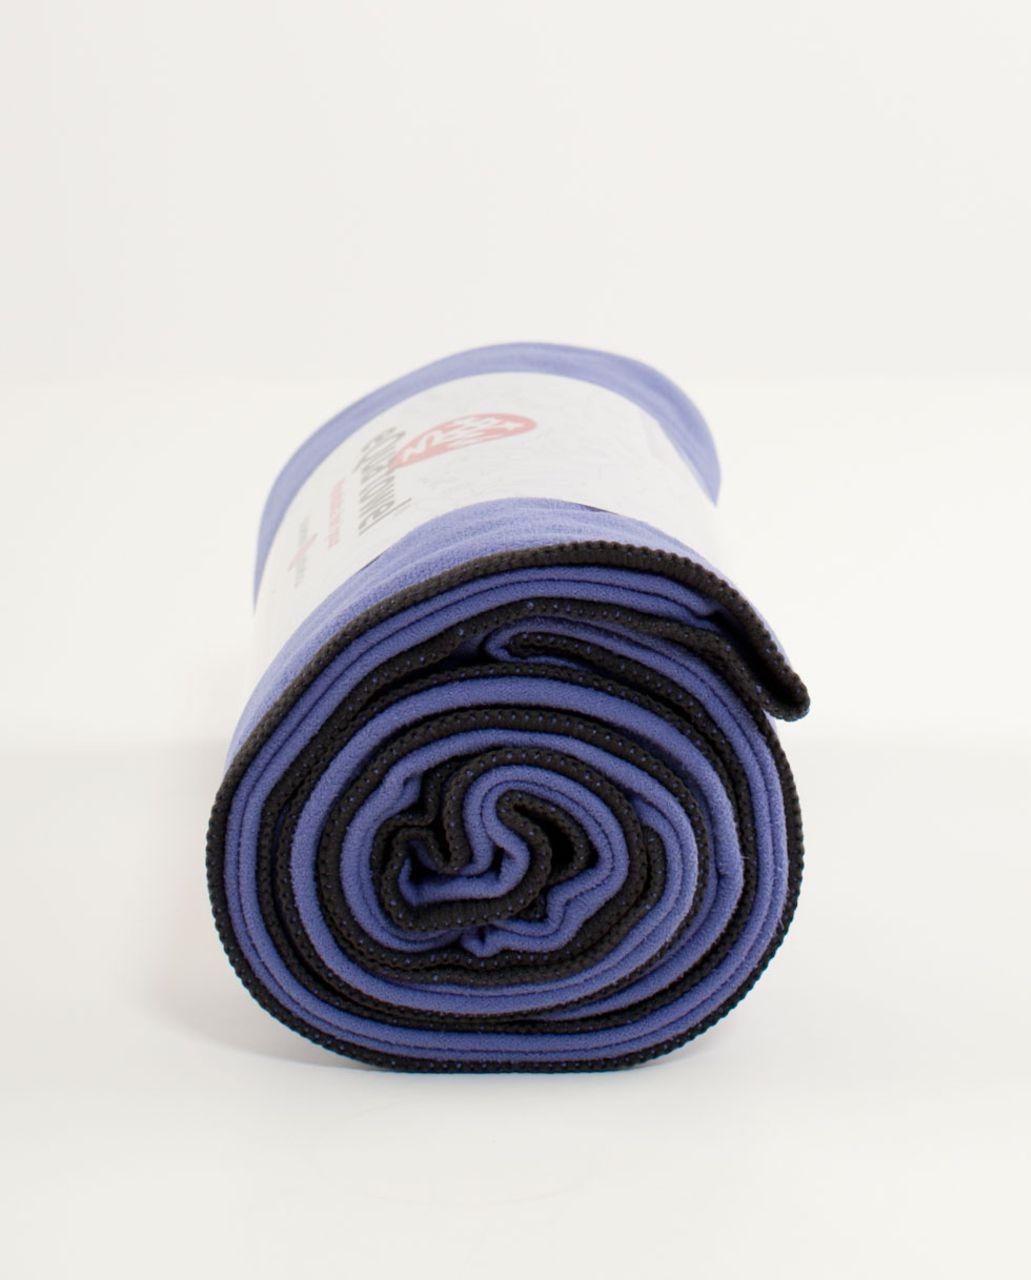 Lululemon Manduka Equa Towel (LG) - Persian Purple